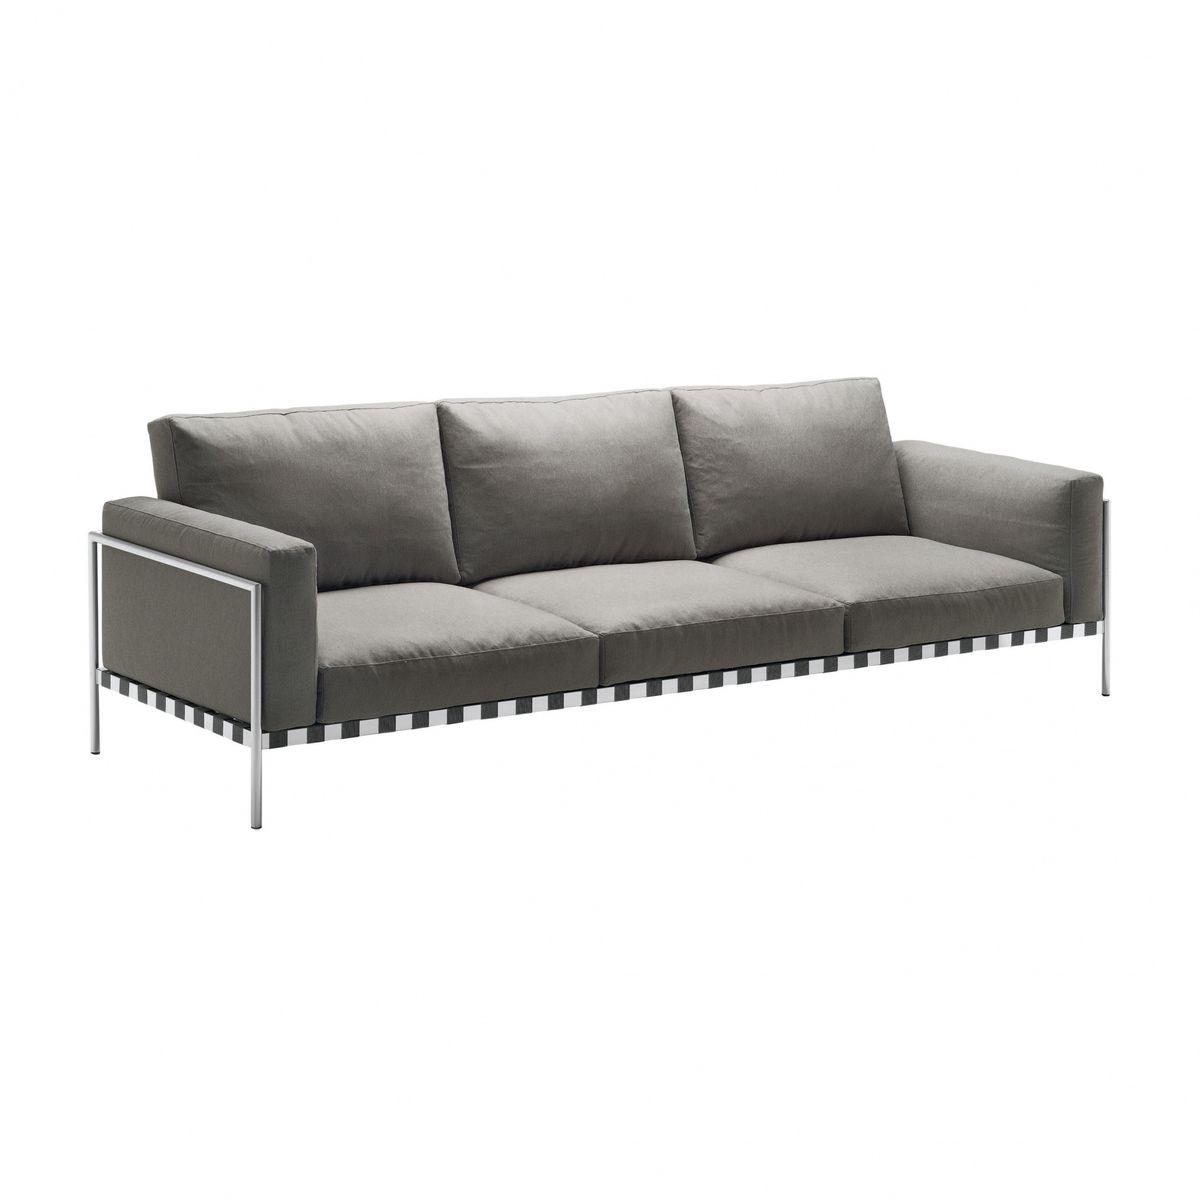 Parco Indoor 3-Seater Sofa | Zanotta | AmbienteDirect.com